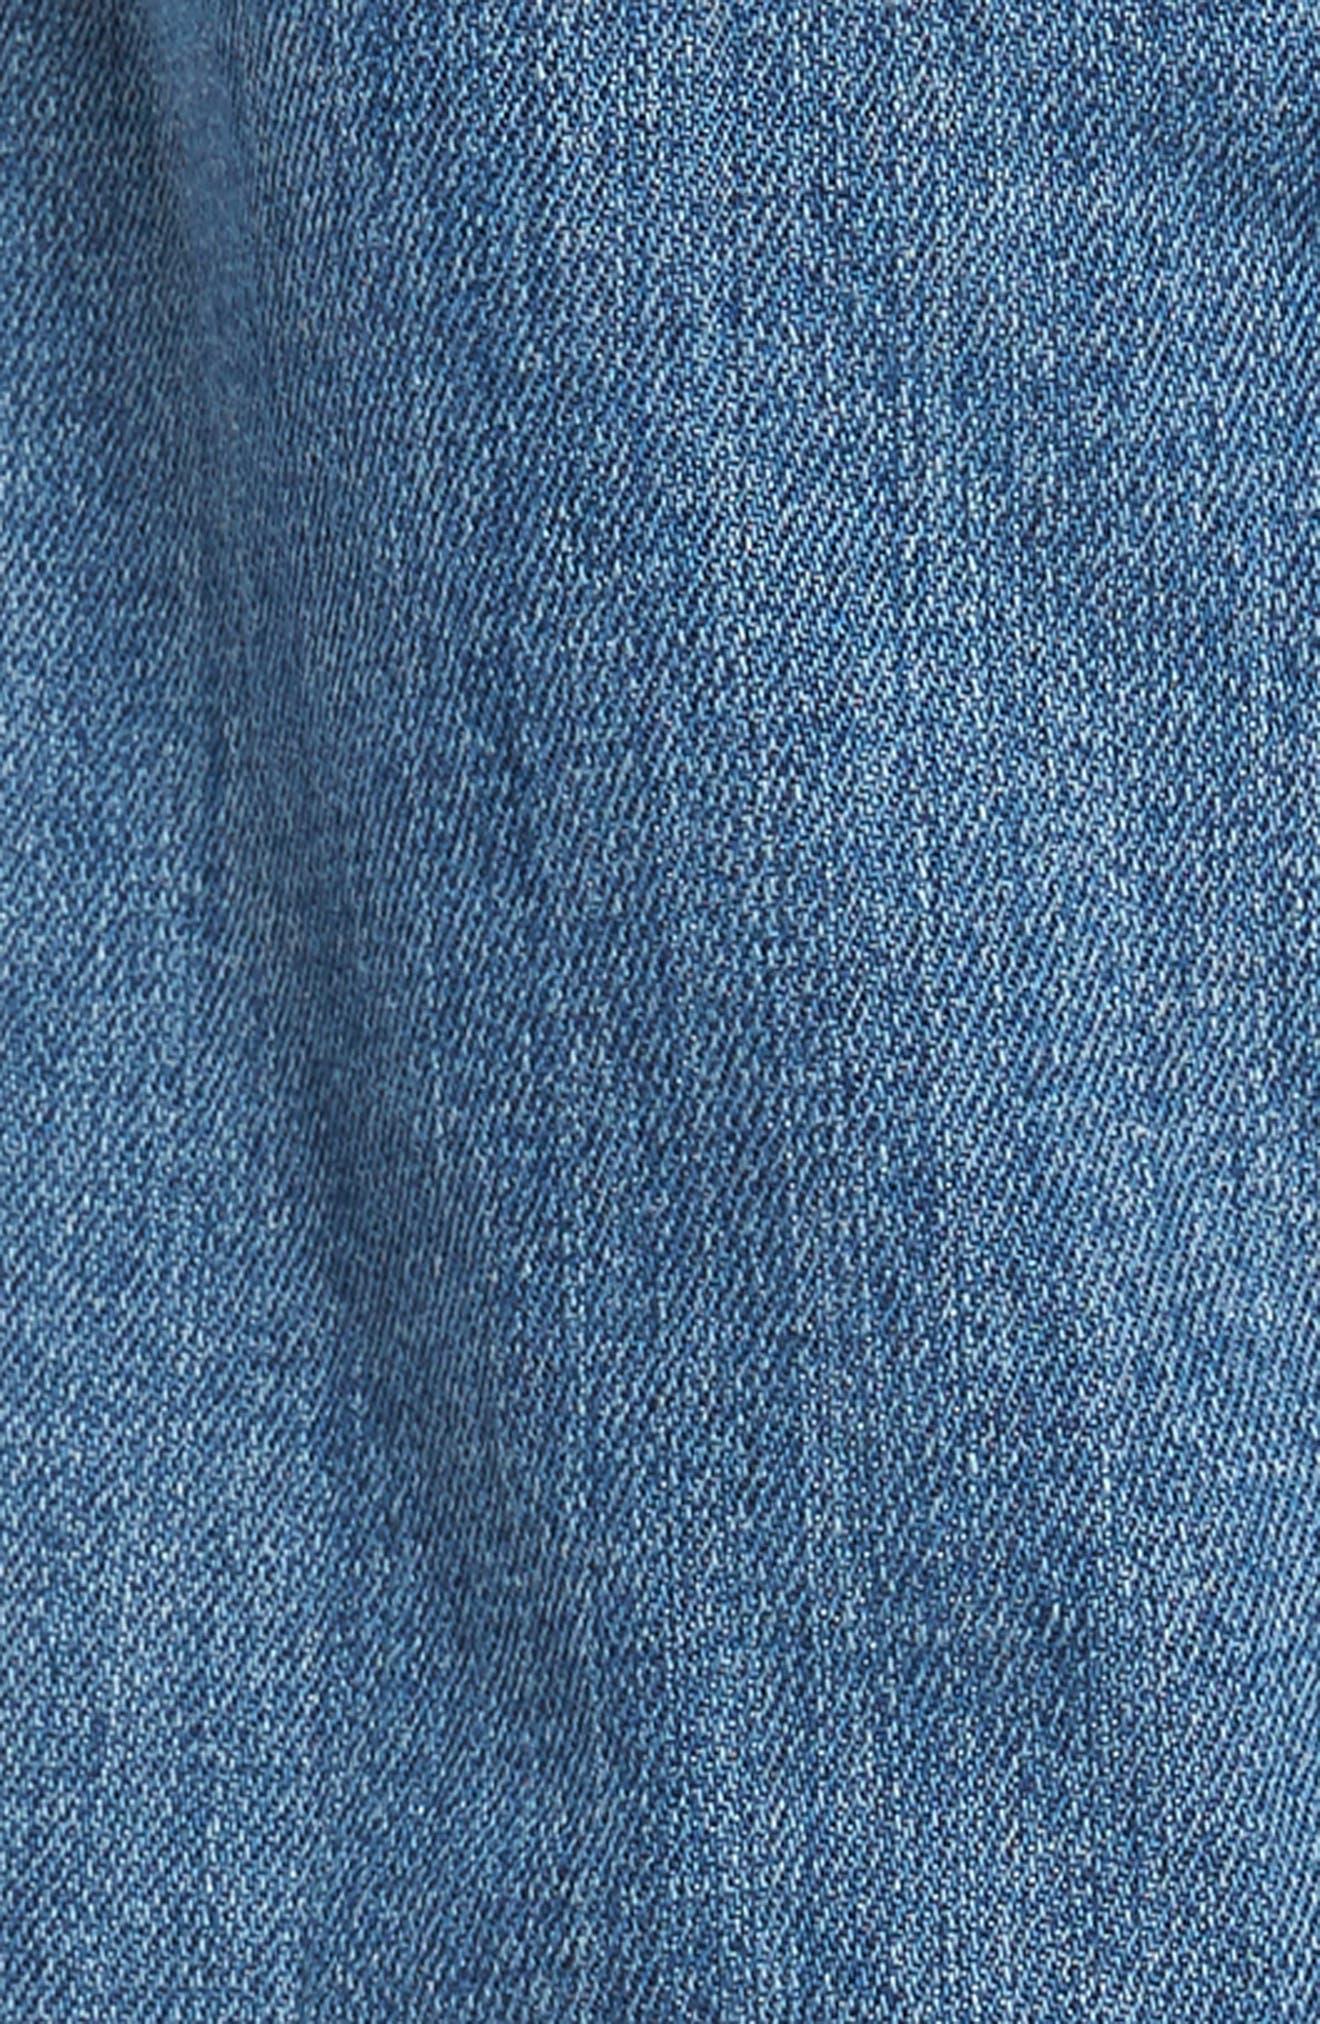 Clark Slim Straight Fit Jeans,                             Alternate thumbnail 5, color,